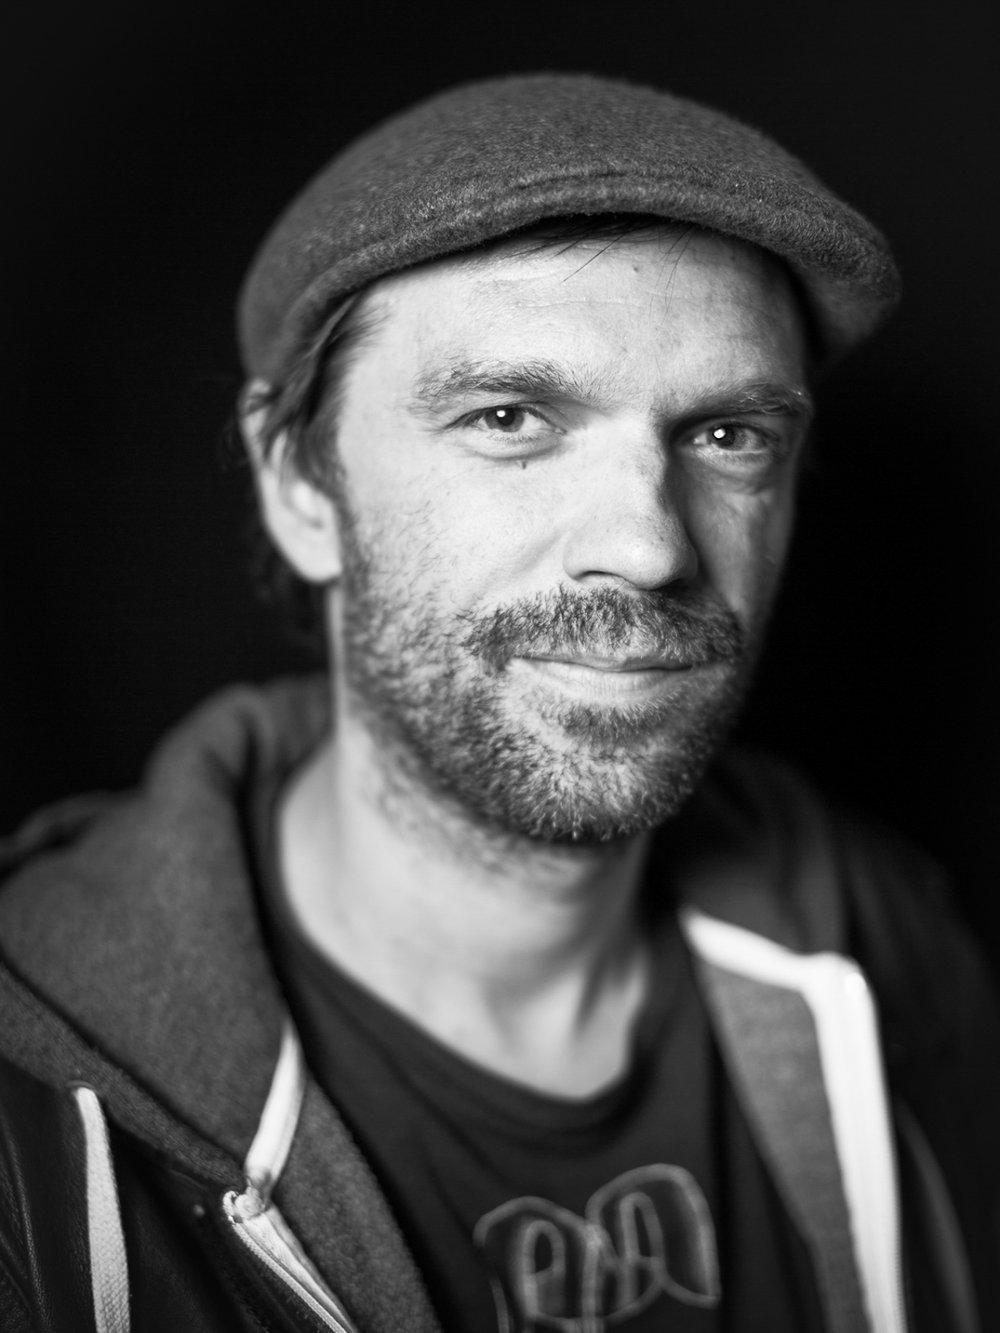 People Fotograf - Besucherportraits am donaufestival